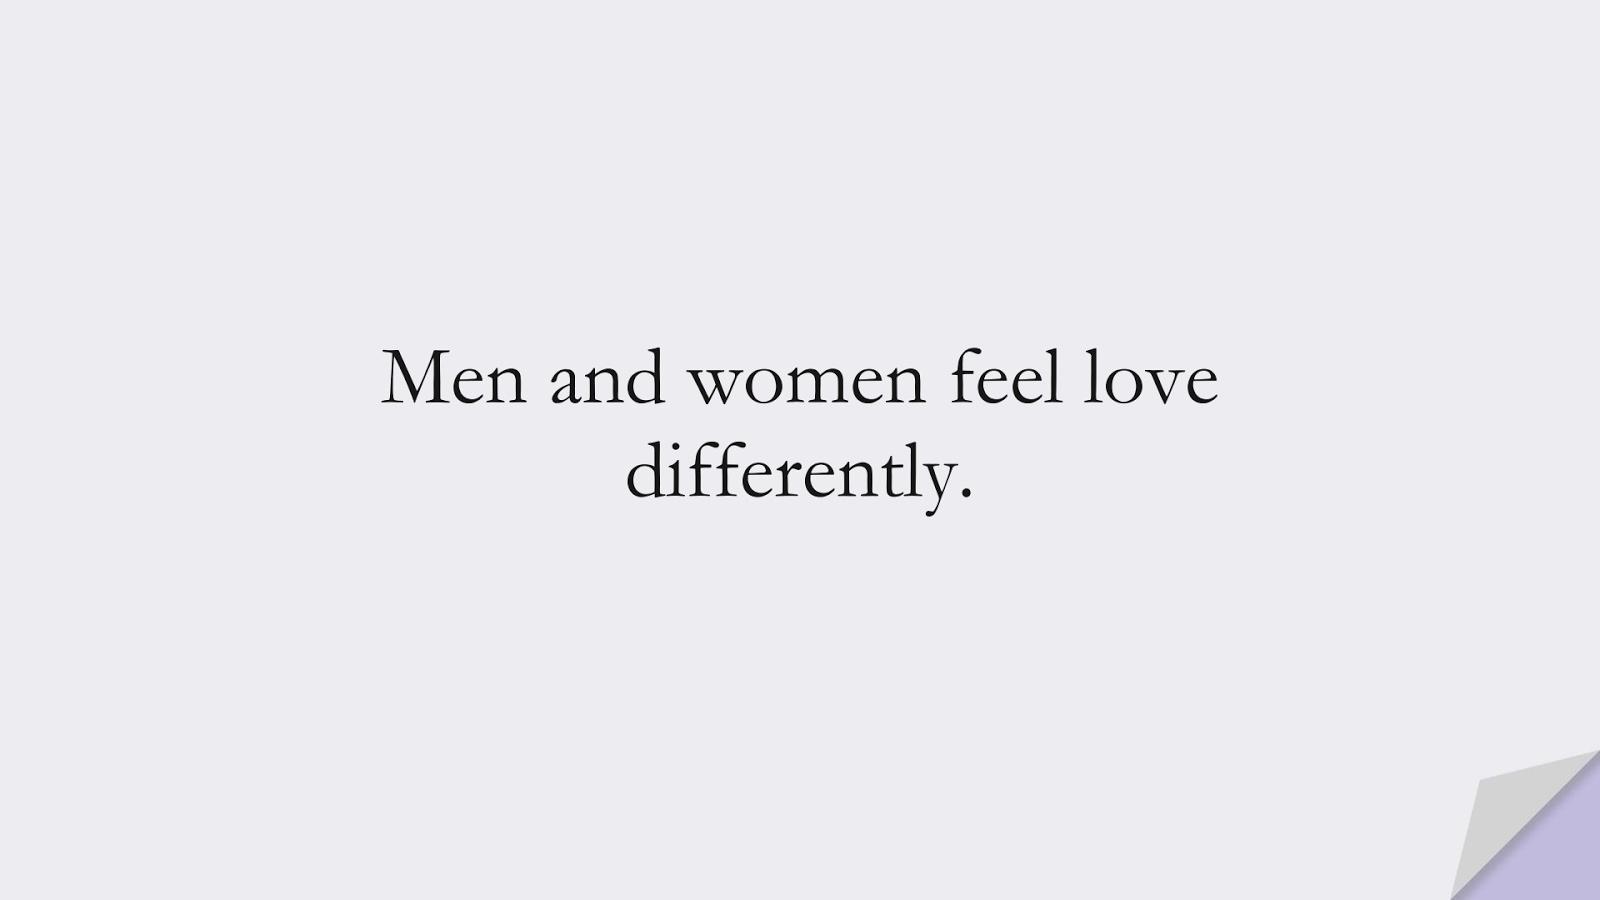 Men and women feel love differently.FALSE